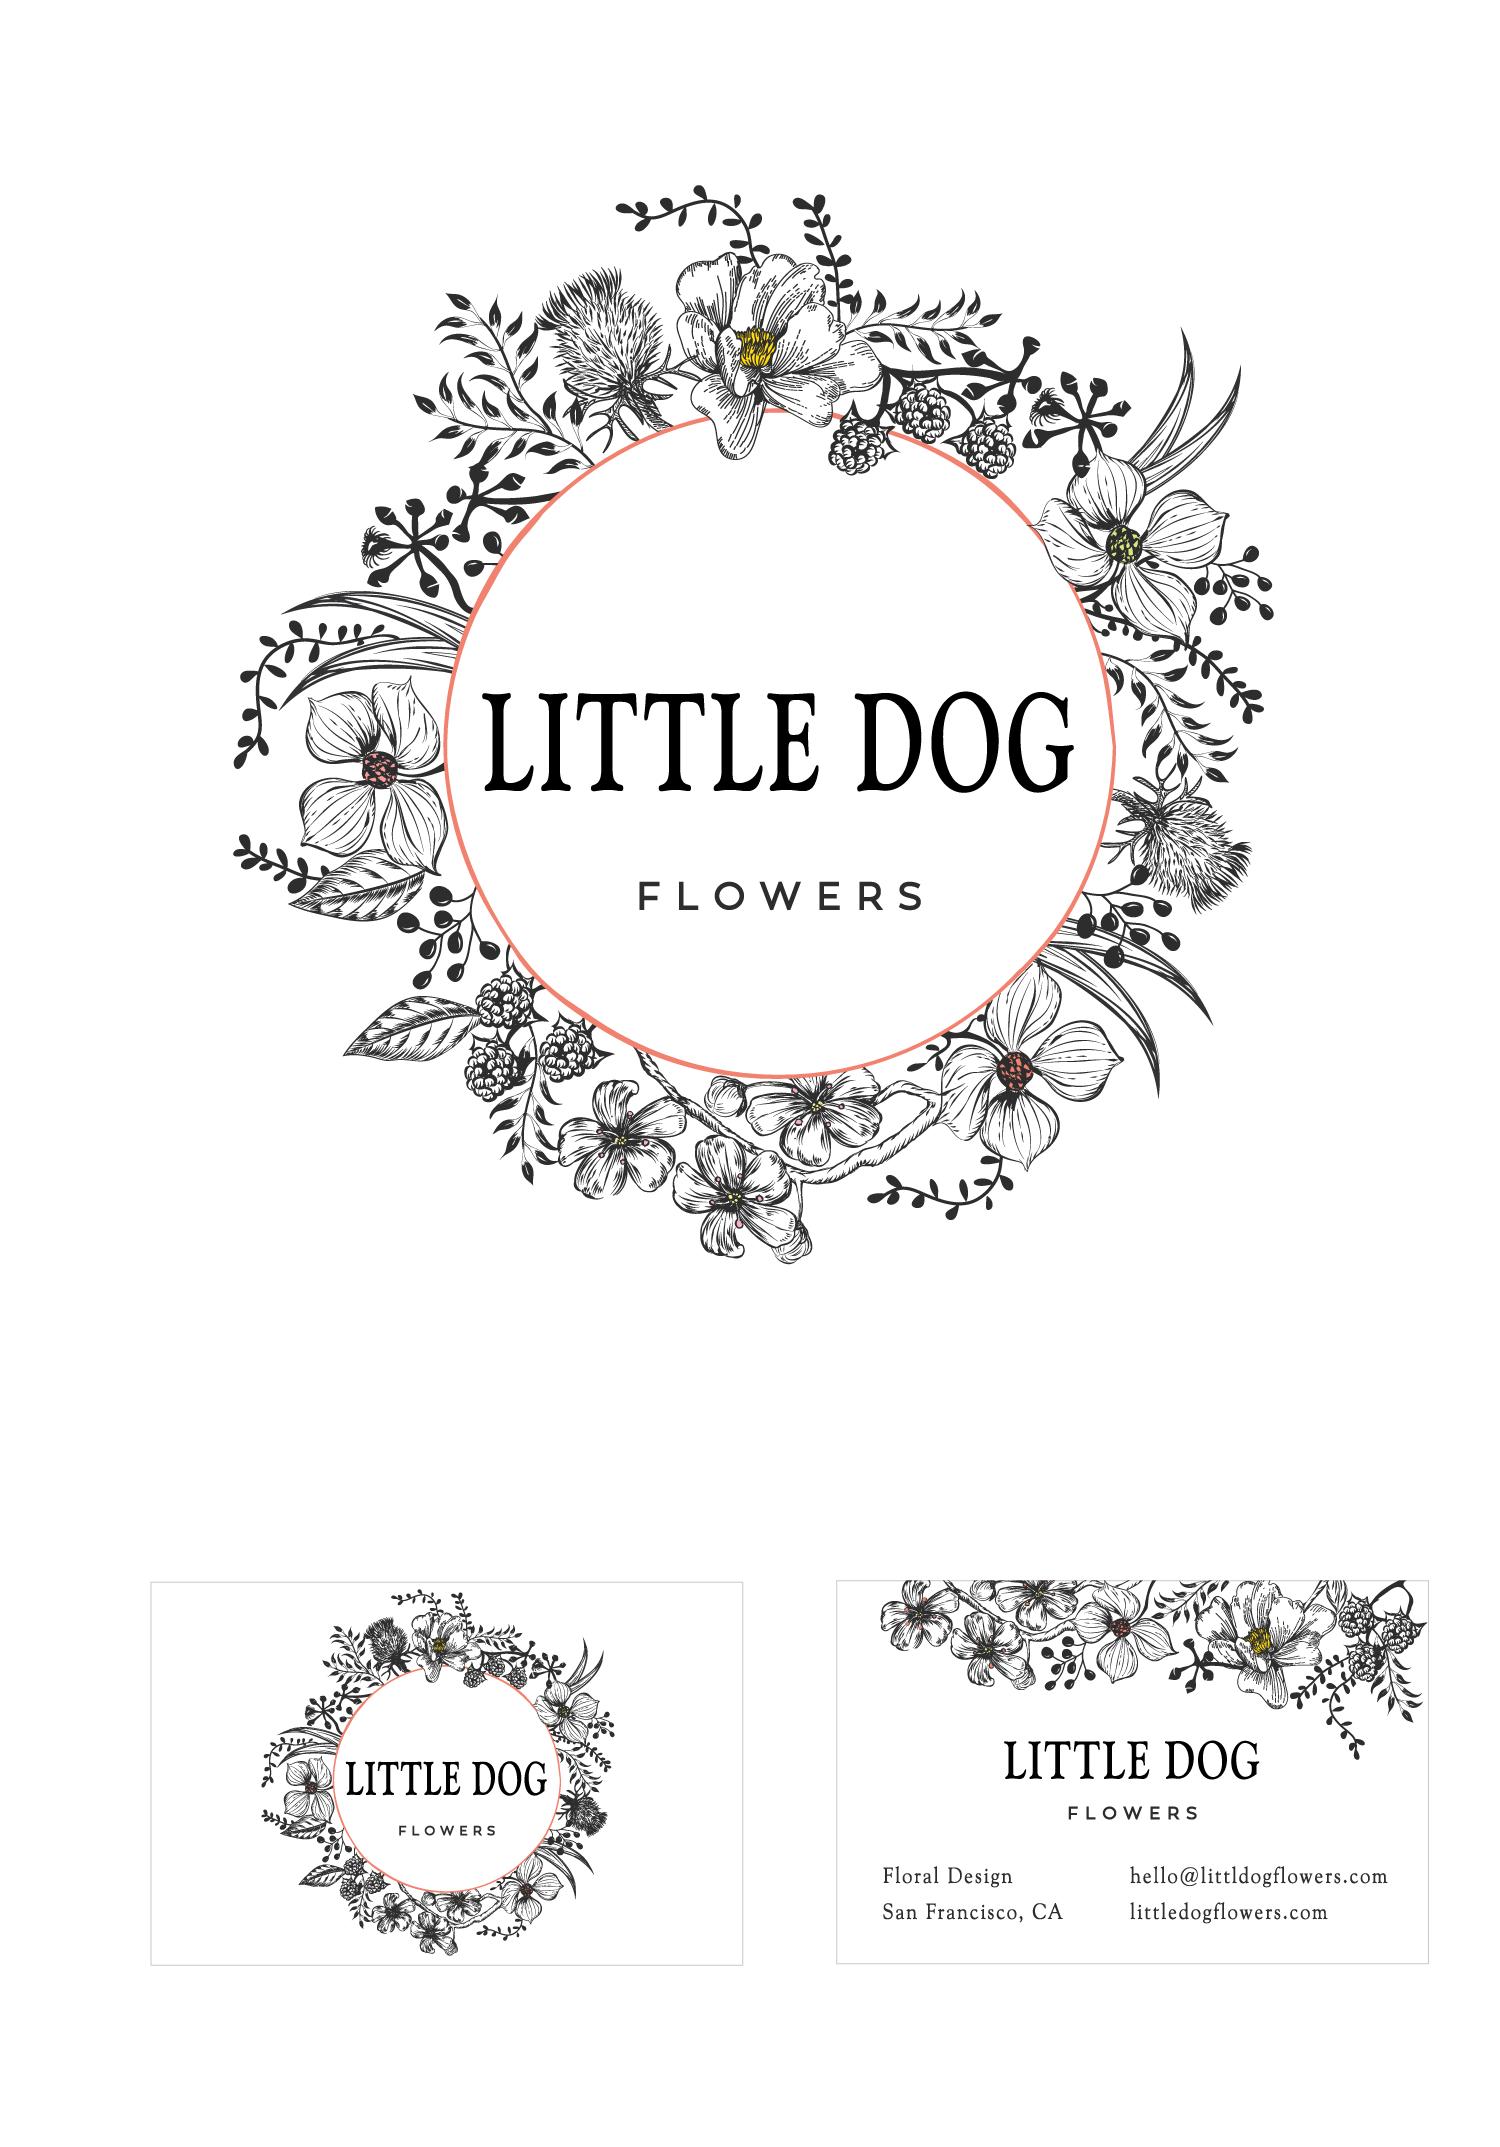 Little Dog Flowers